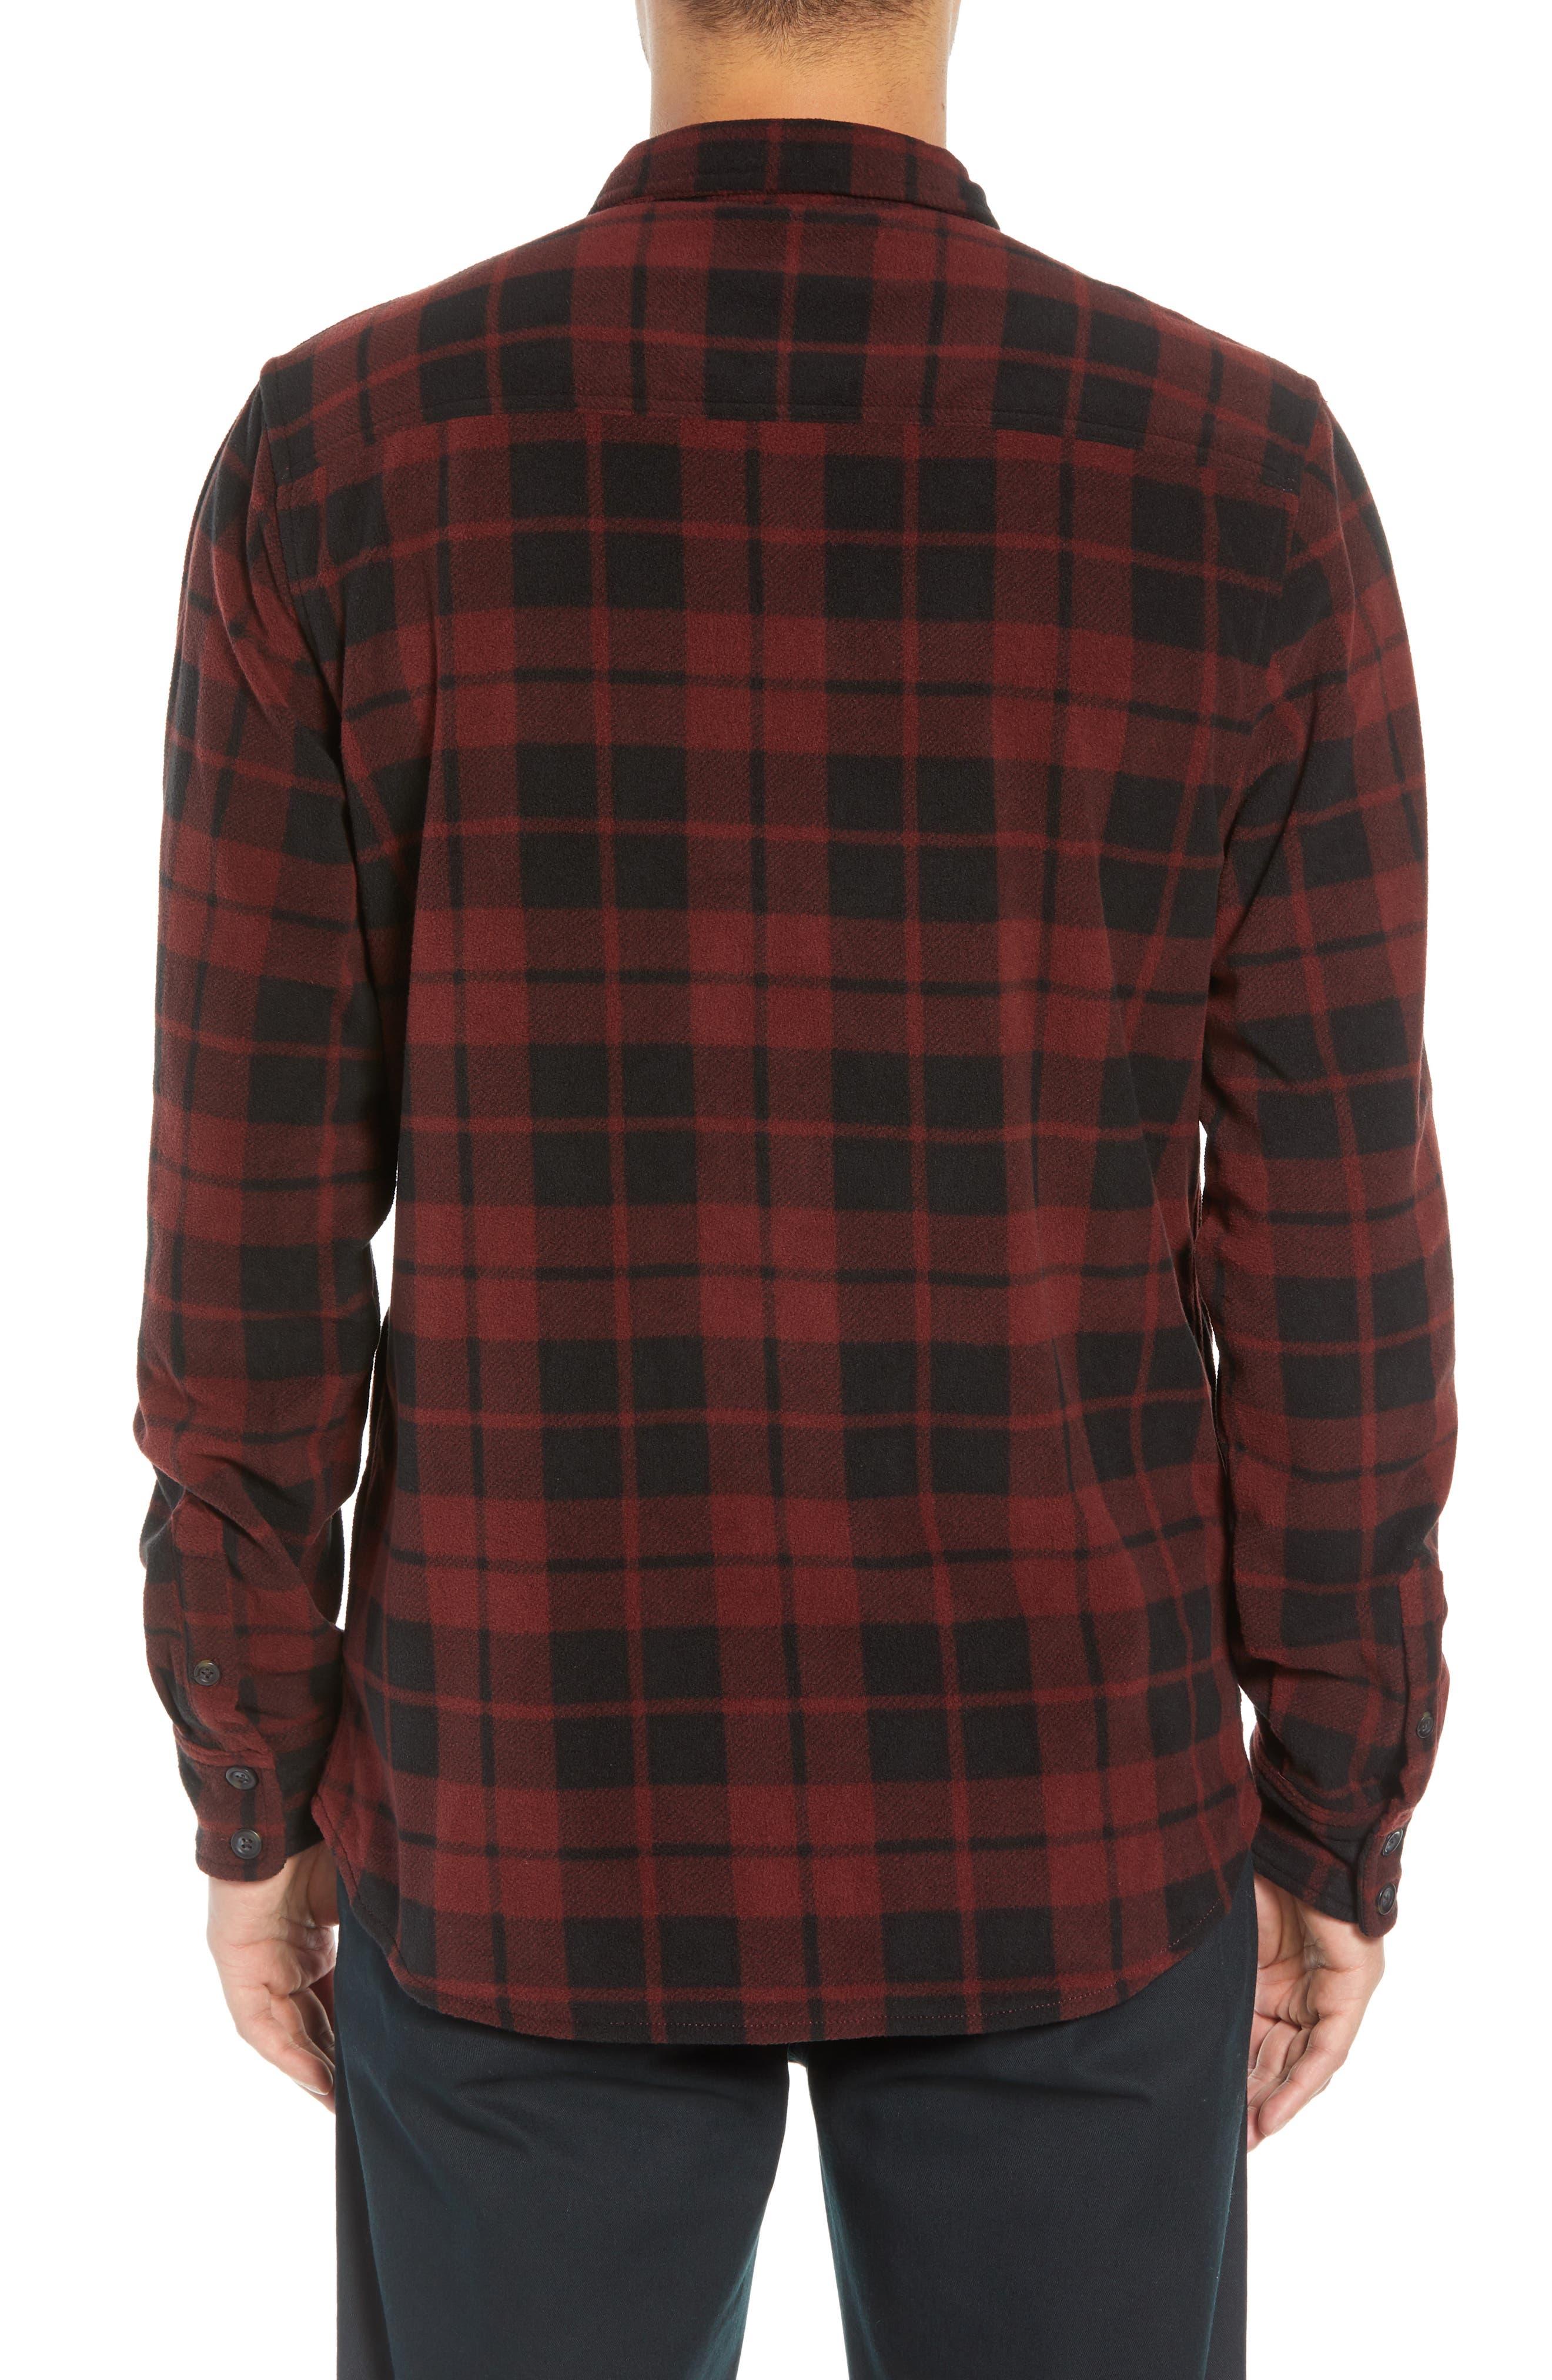 Hillcrest Fleece Shirt,                             Alternate thumbnail 2, color,                             930